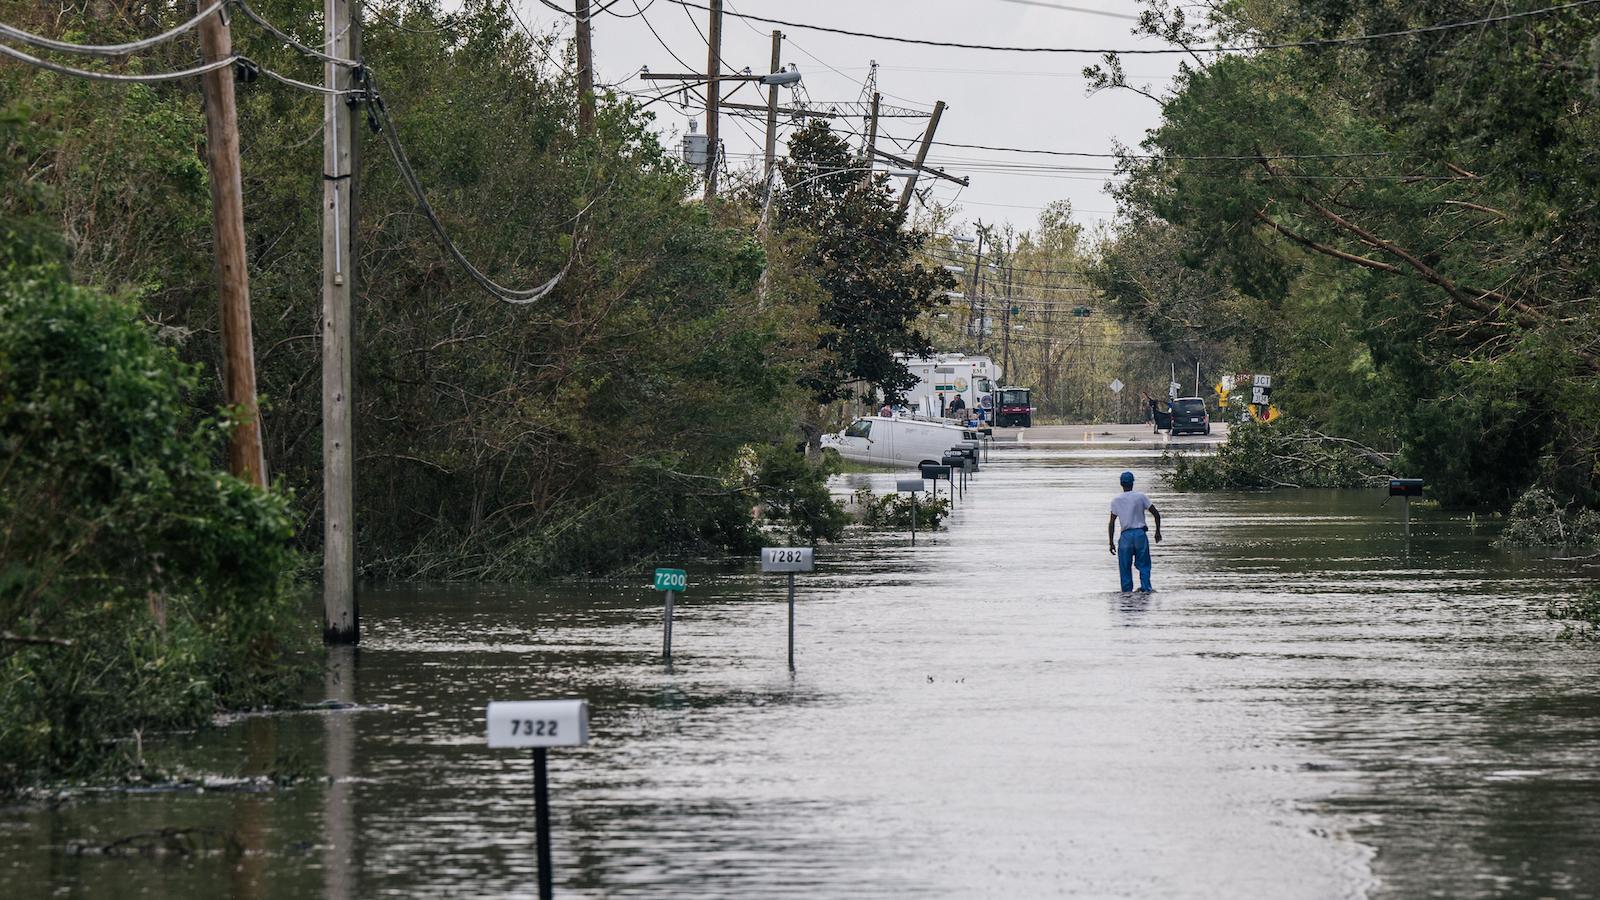 Flooding in Barataria, Louisiana, from Hurricane Ida